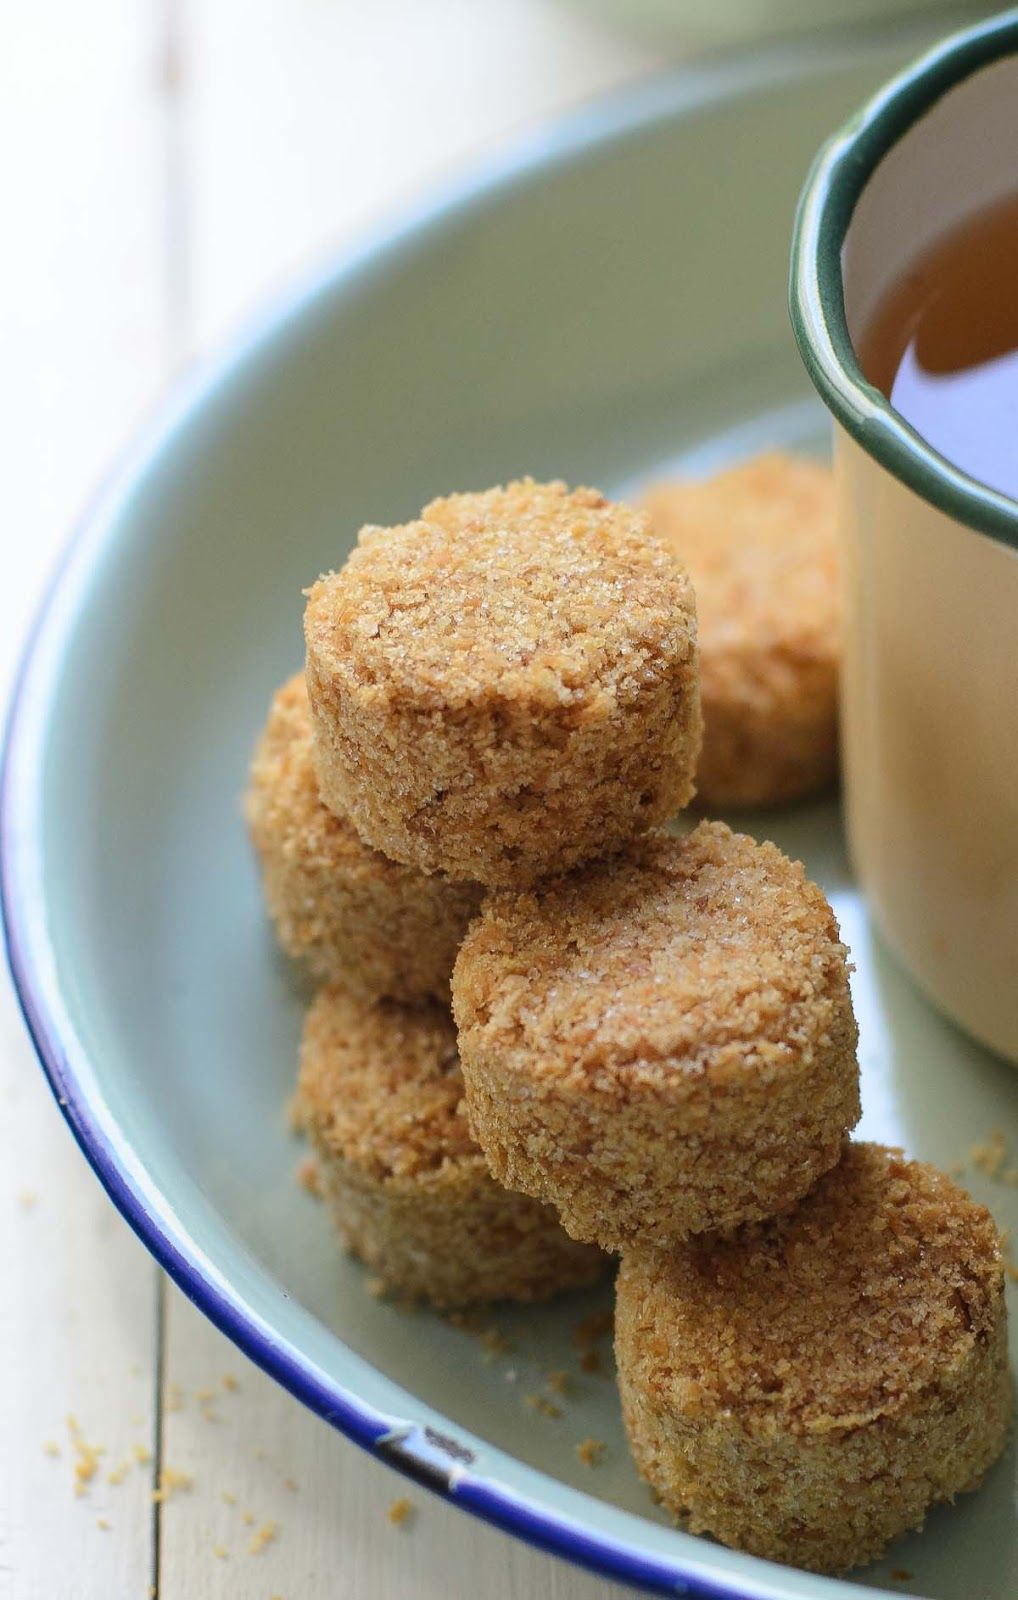 Resipi Biskut Kelapa Cina Delicious Cookie Recipes Savory Dessert Recipes Dessert Recipes Easy